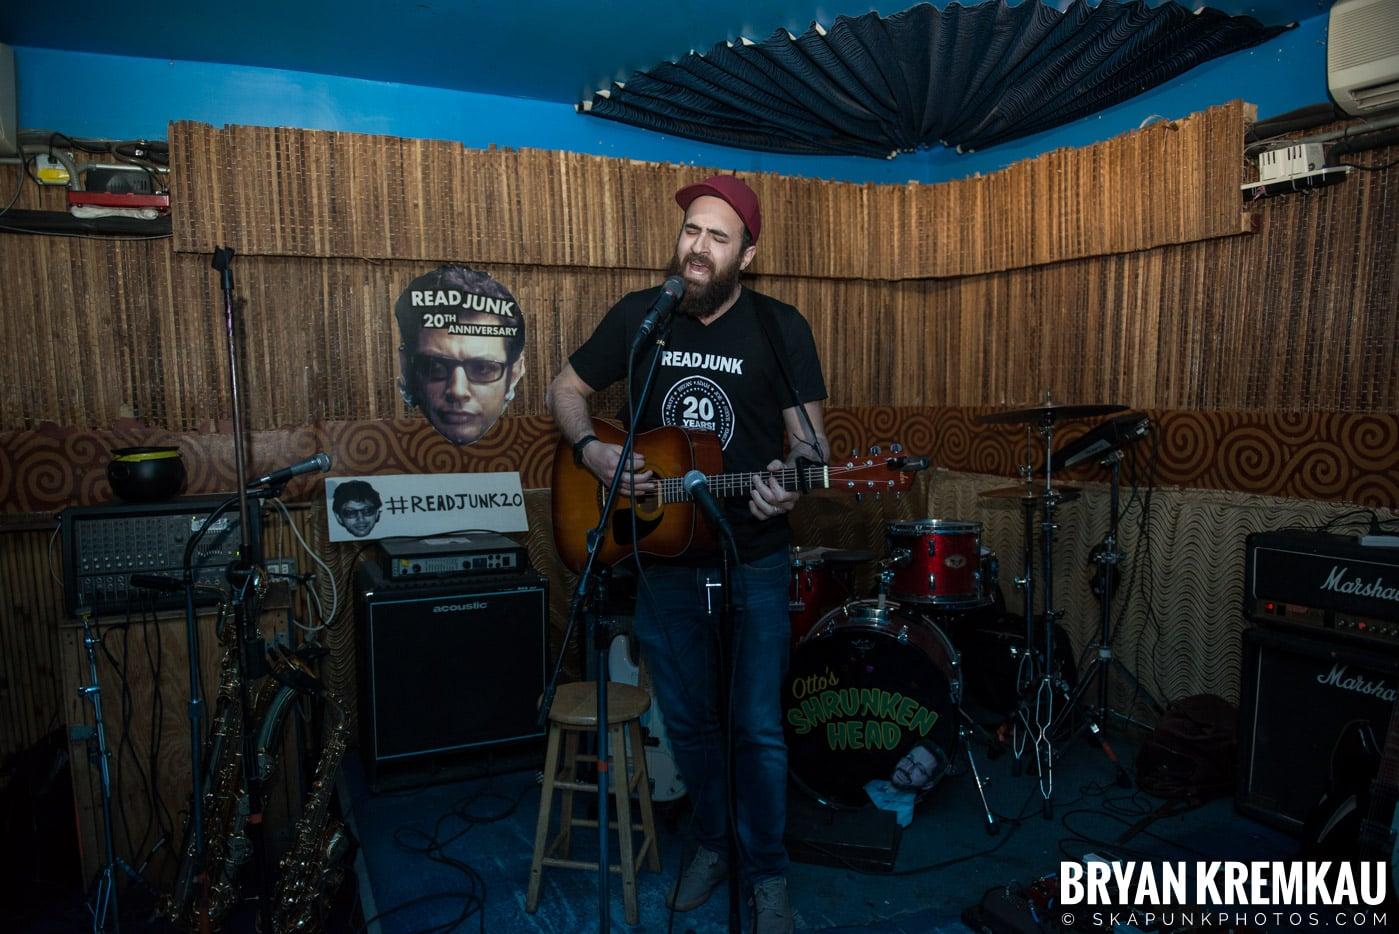 ReadJunk.com 20th Anniversary Party @ Otto's Shrunken Head, NYC - 4.29.17 (71)